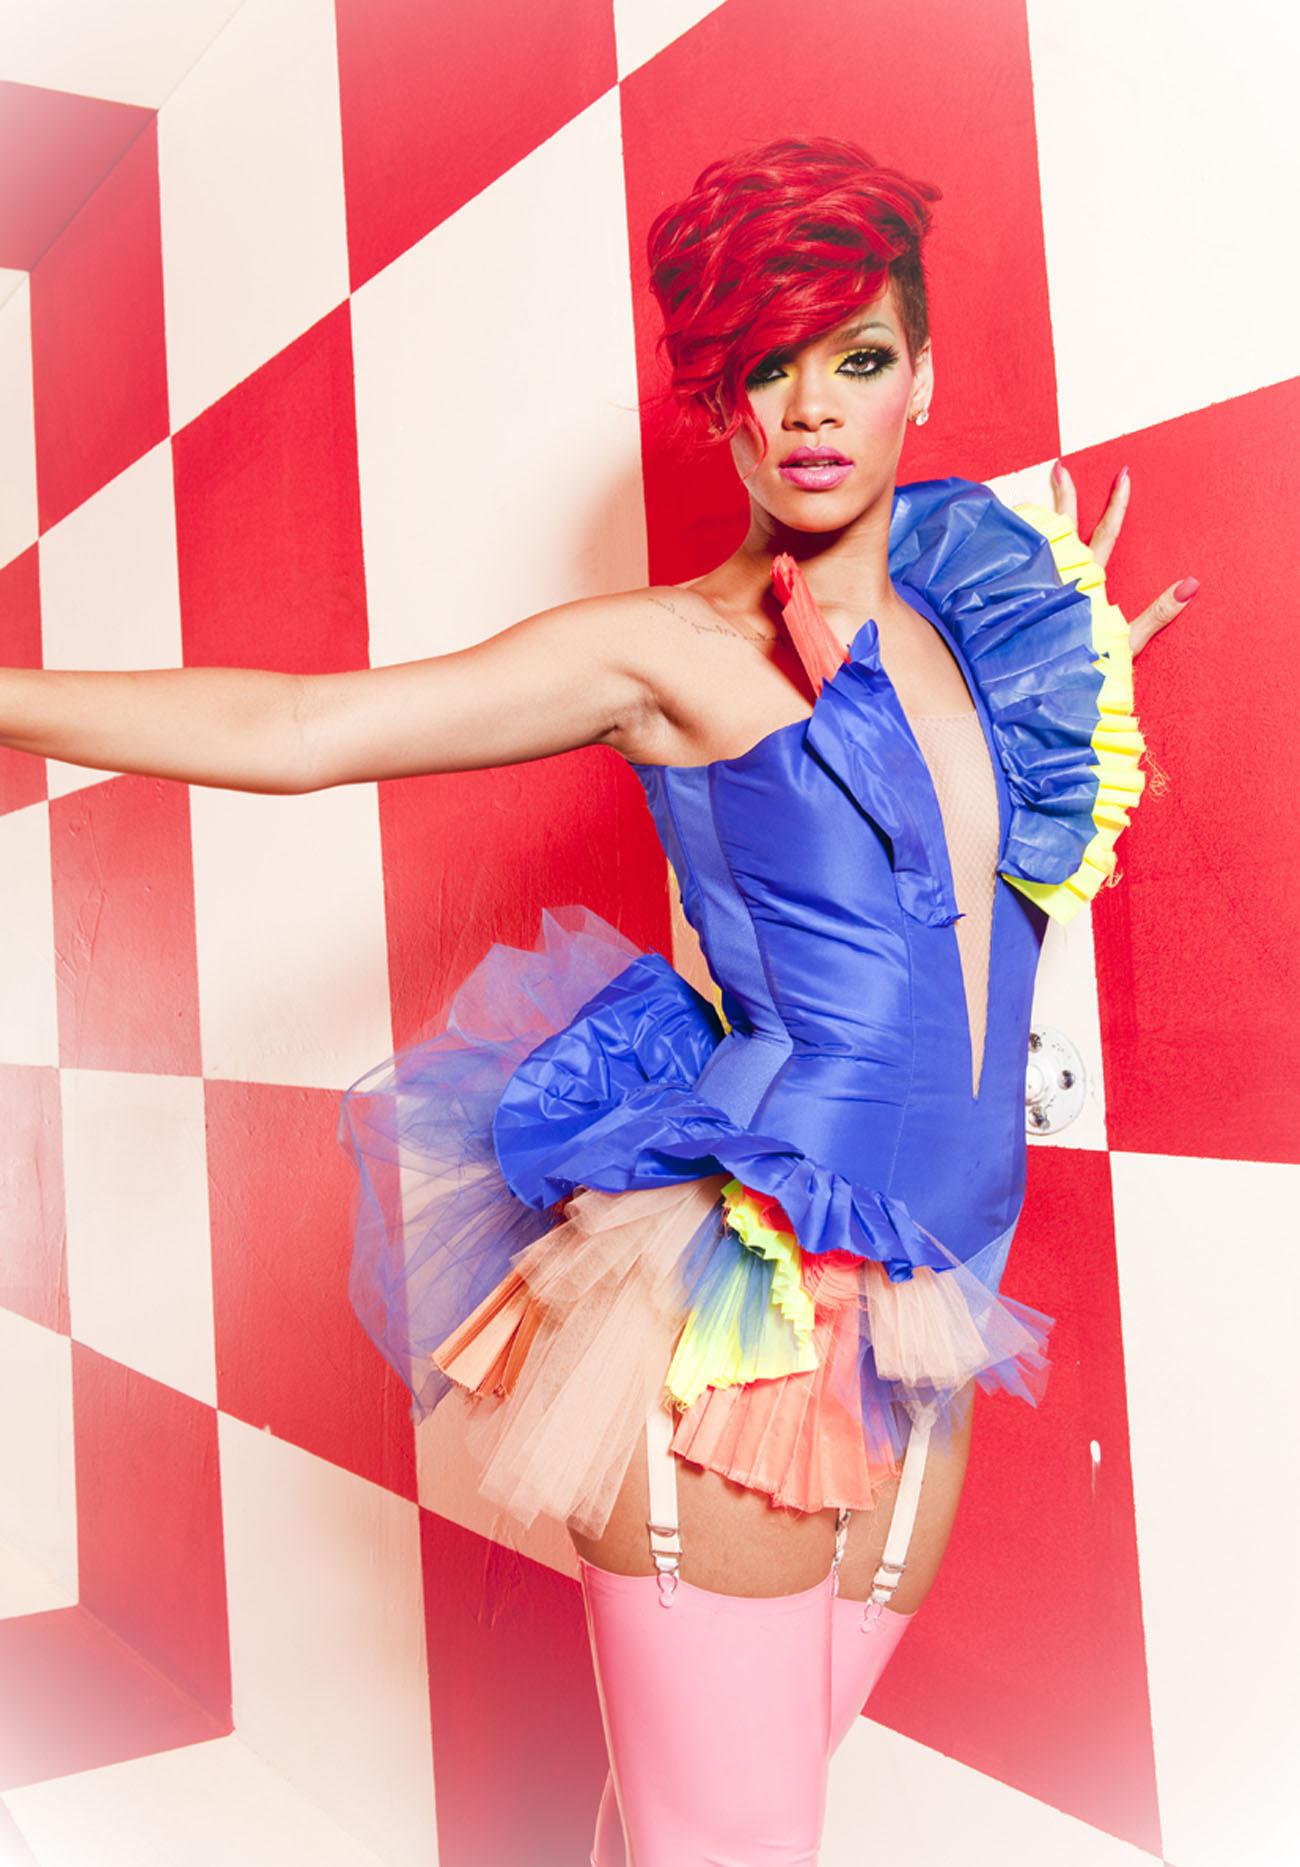 64752_RihannaWhosThatChickShoot2_122_1200lo.jpg